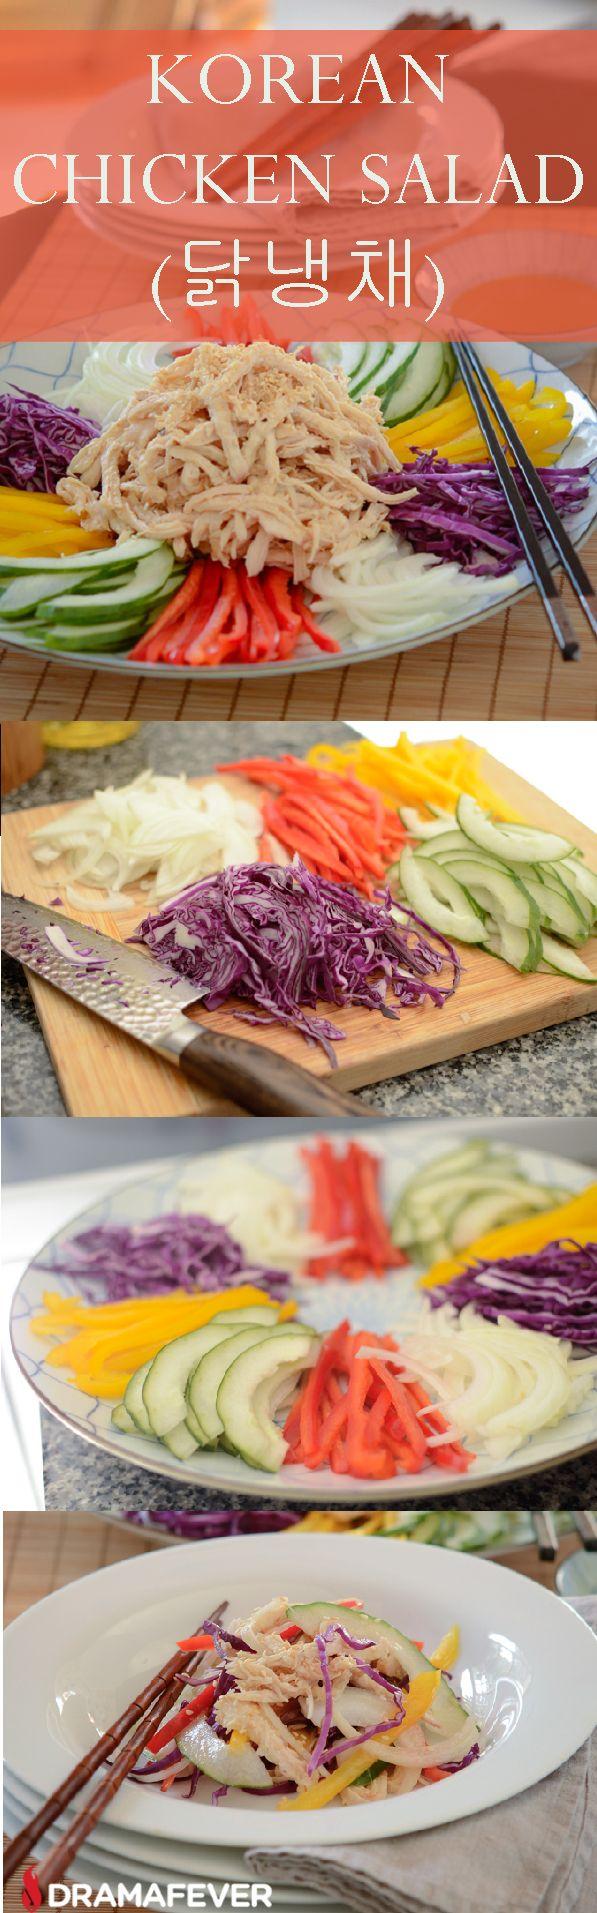 How to make korean chicken salad dak nangchae korean food forumfinder Gallery